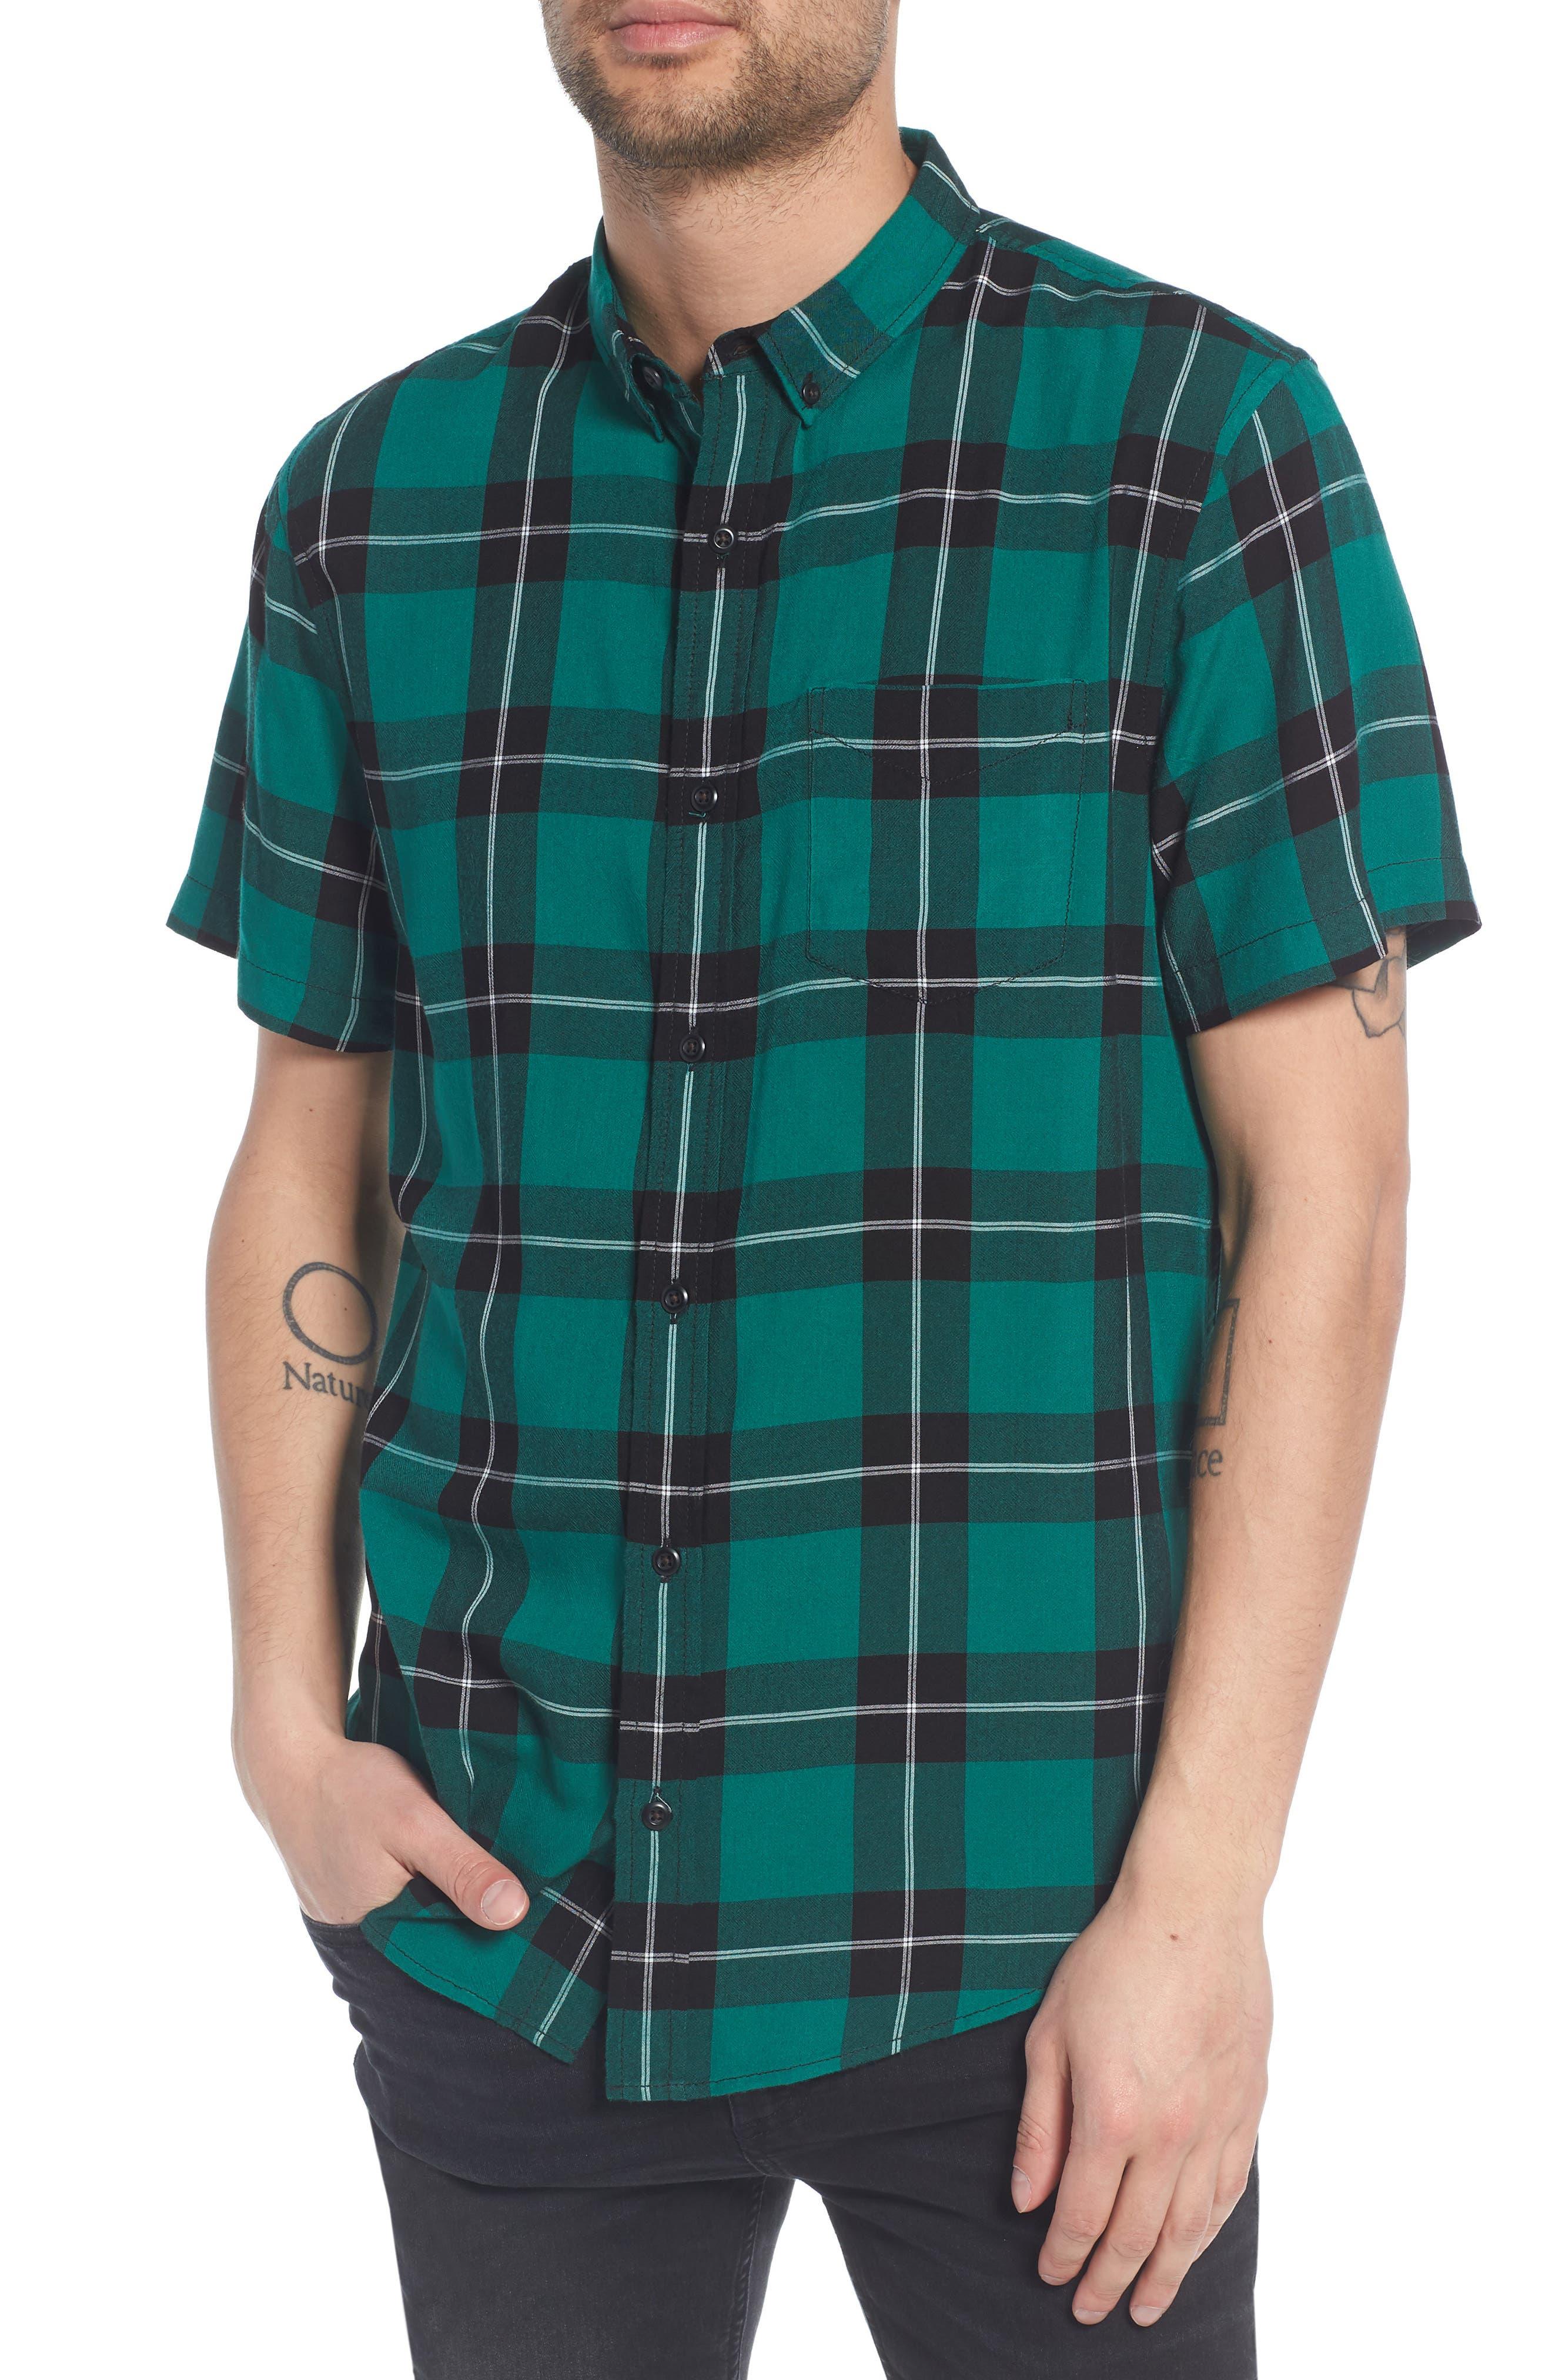 Yarn Dyed Plaid Shirt,                             Main thumbnail 1, color,                             BLACK GREEN LIV PLAID